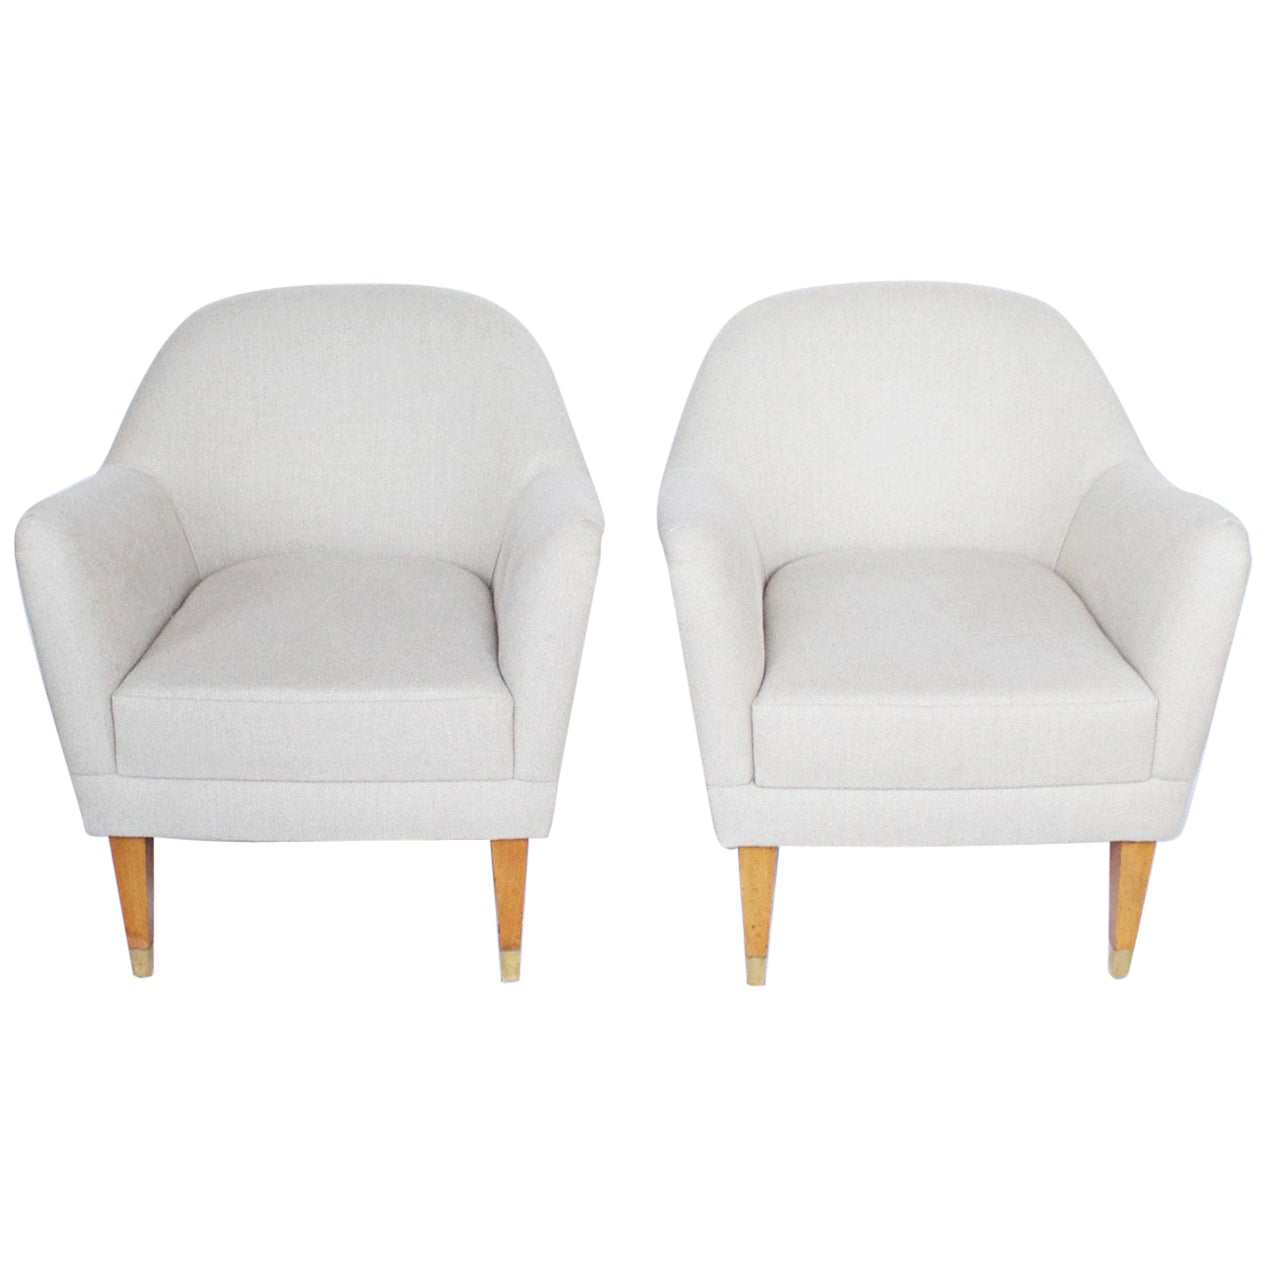 Pair of Midcentury Italian Bedroom Chairs Re-Upholstered in Linen